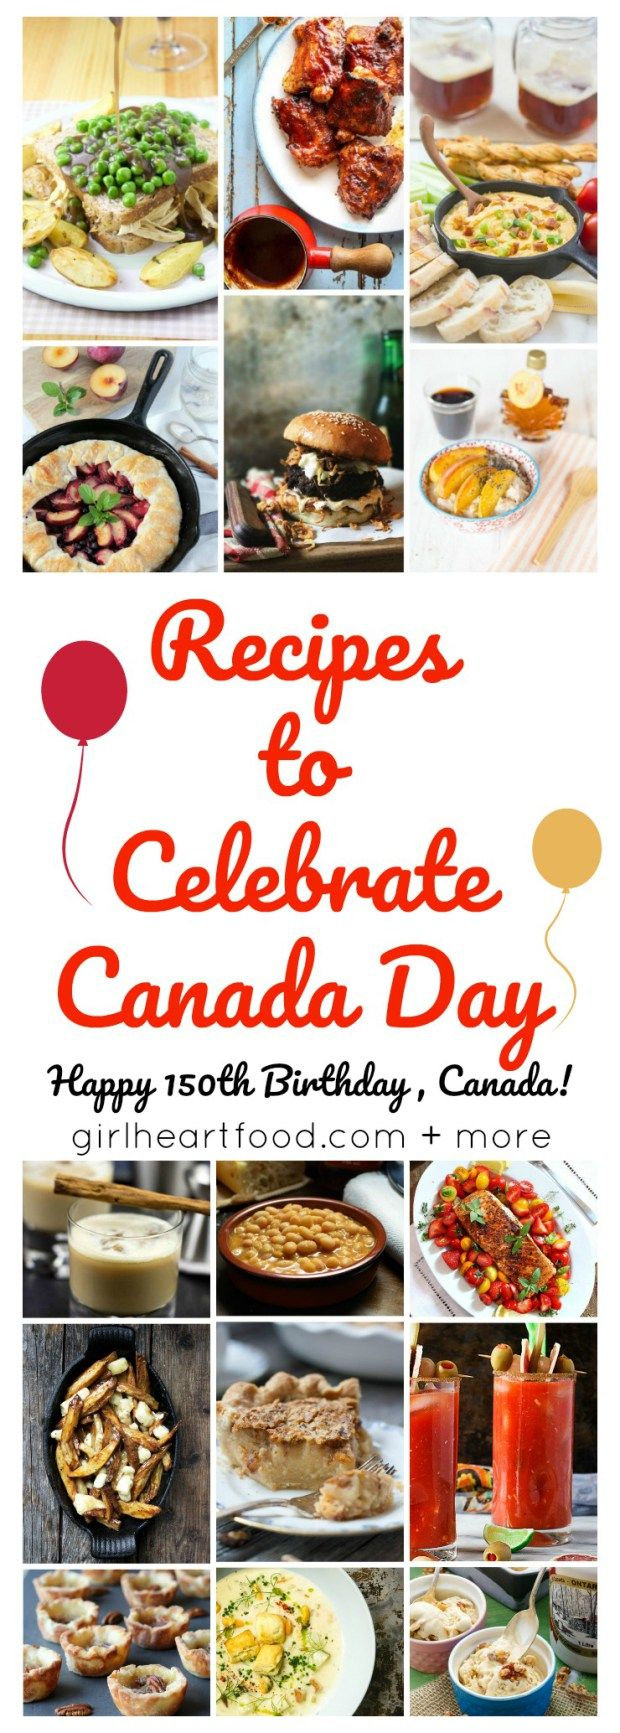 Recipes to Celebrate Canada Day (Happy 150th Birthday Canada) - girlheartfood.com + more